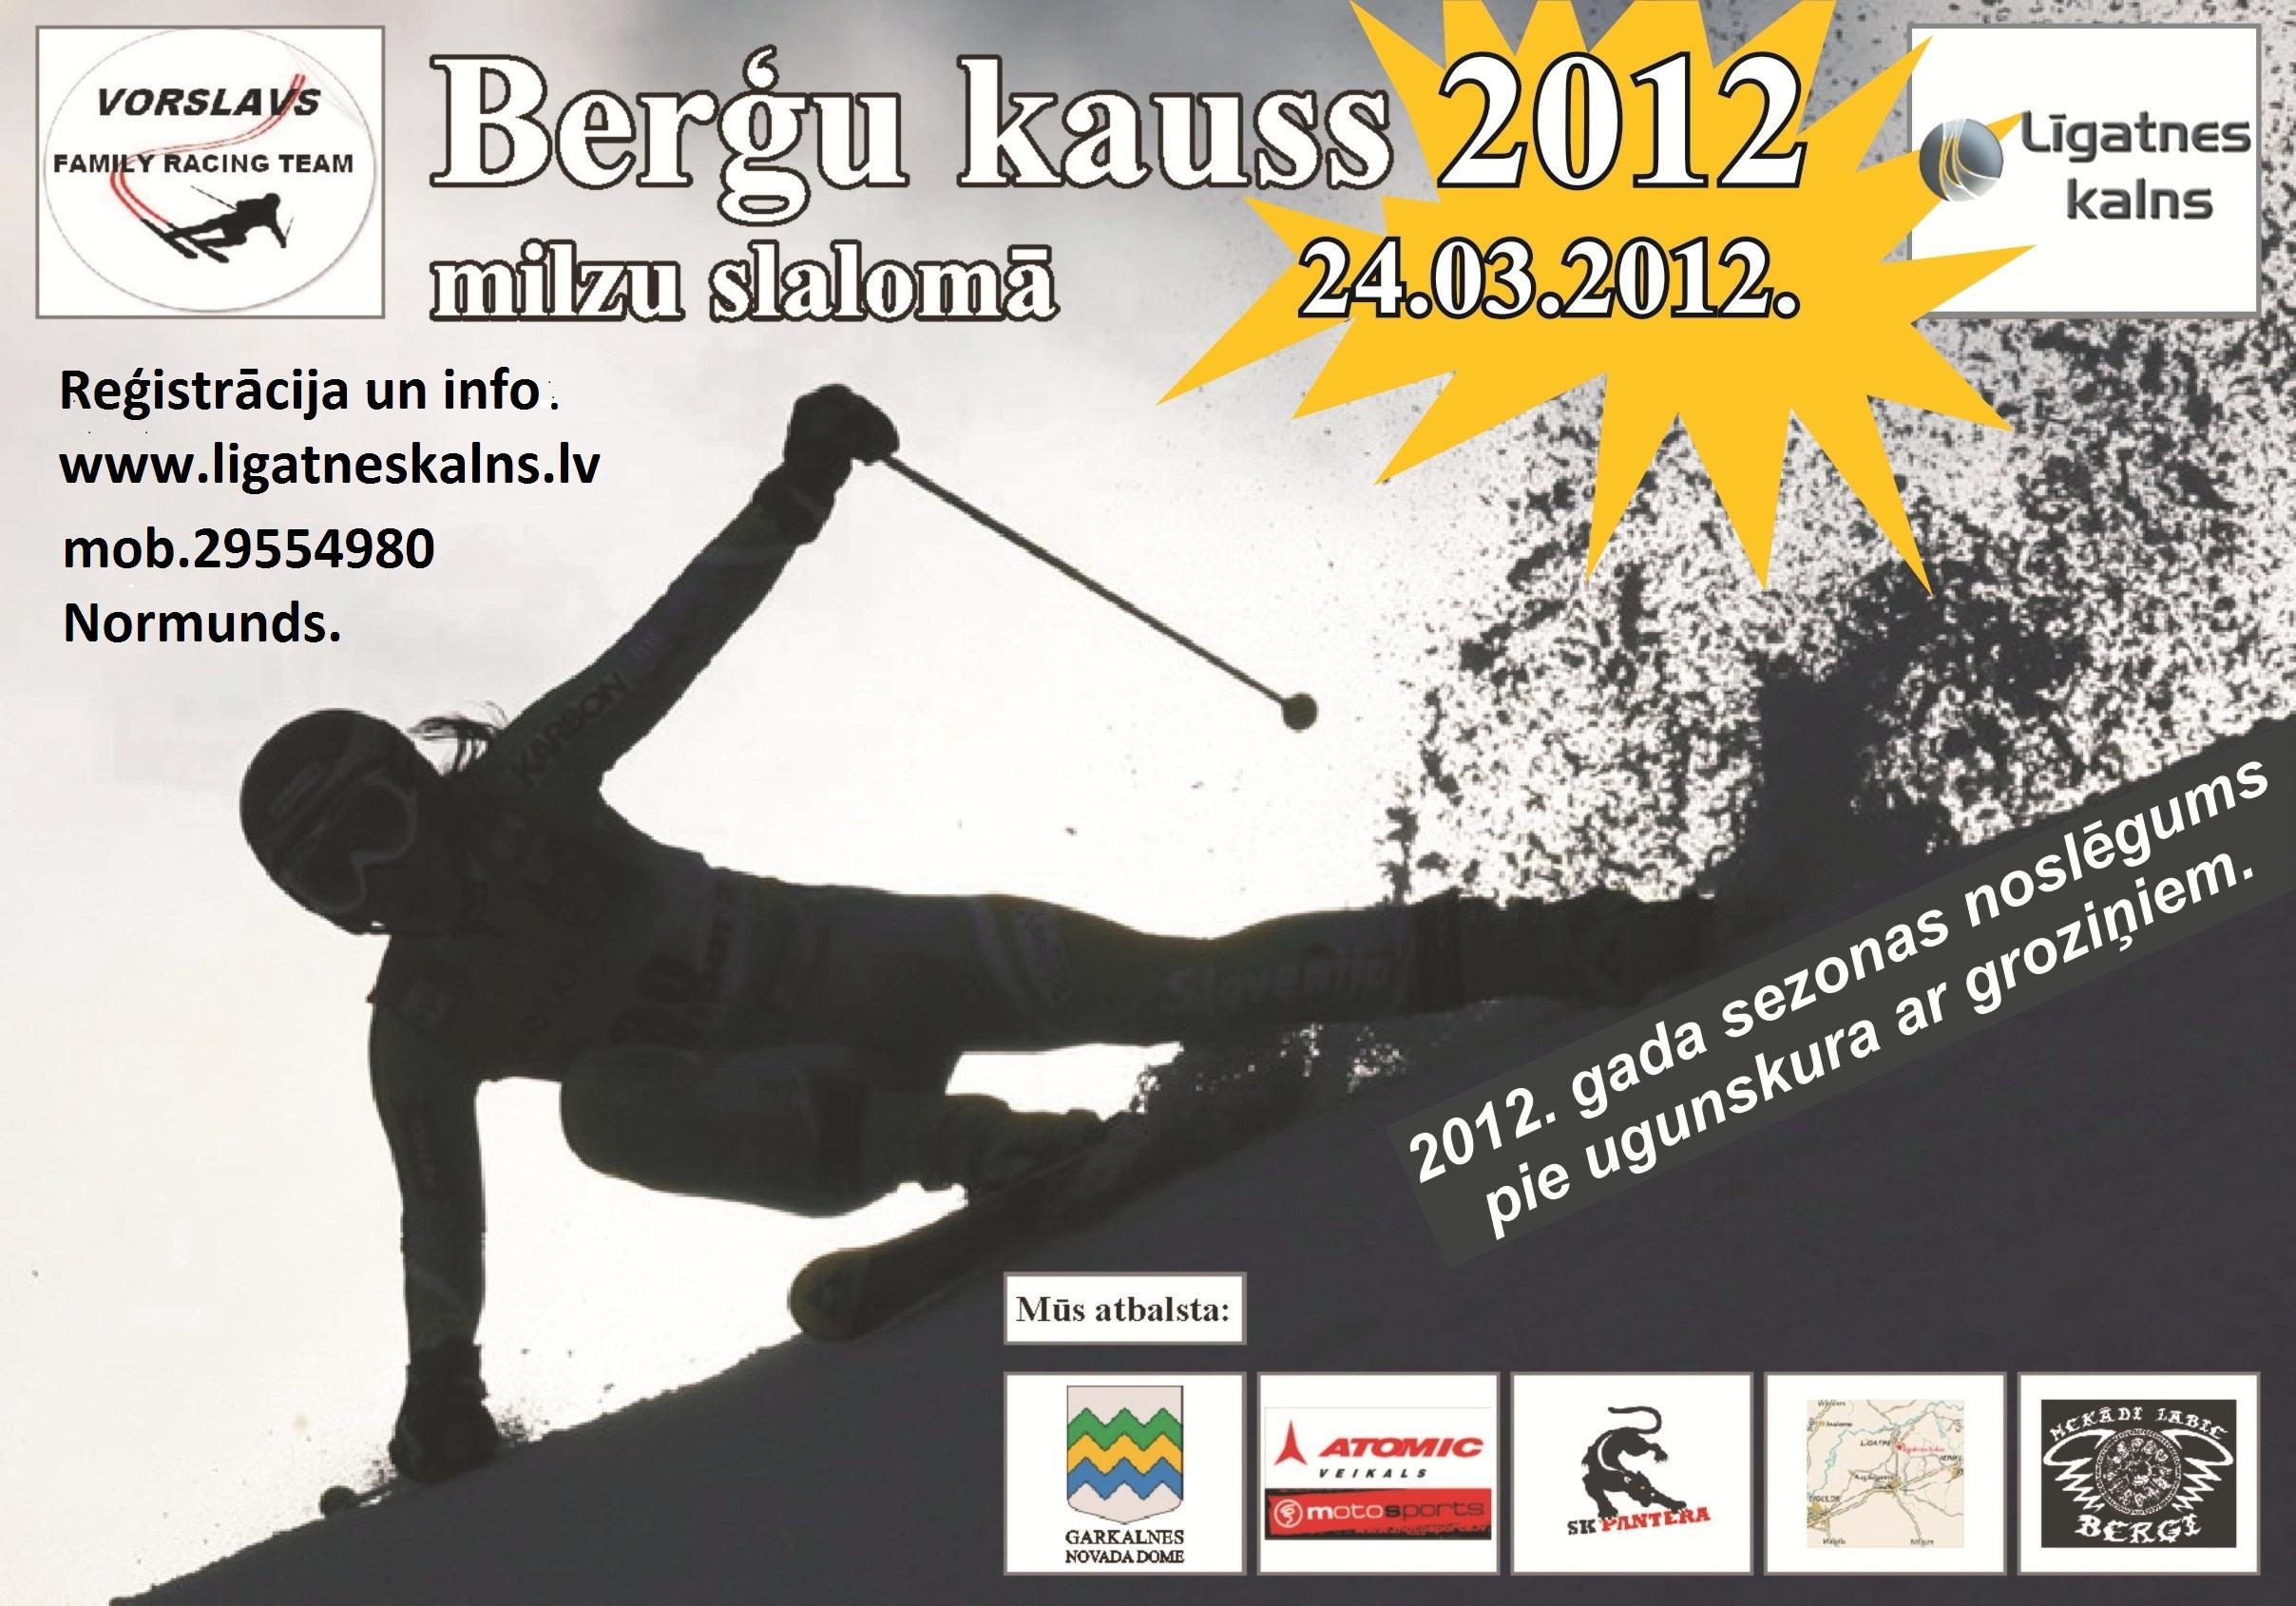 plakats Bergu kauss 2012.jpg